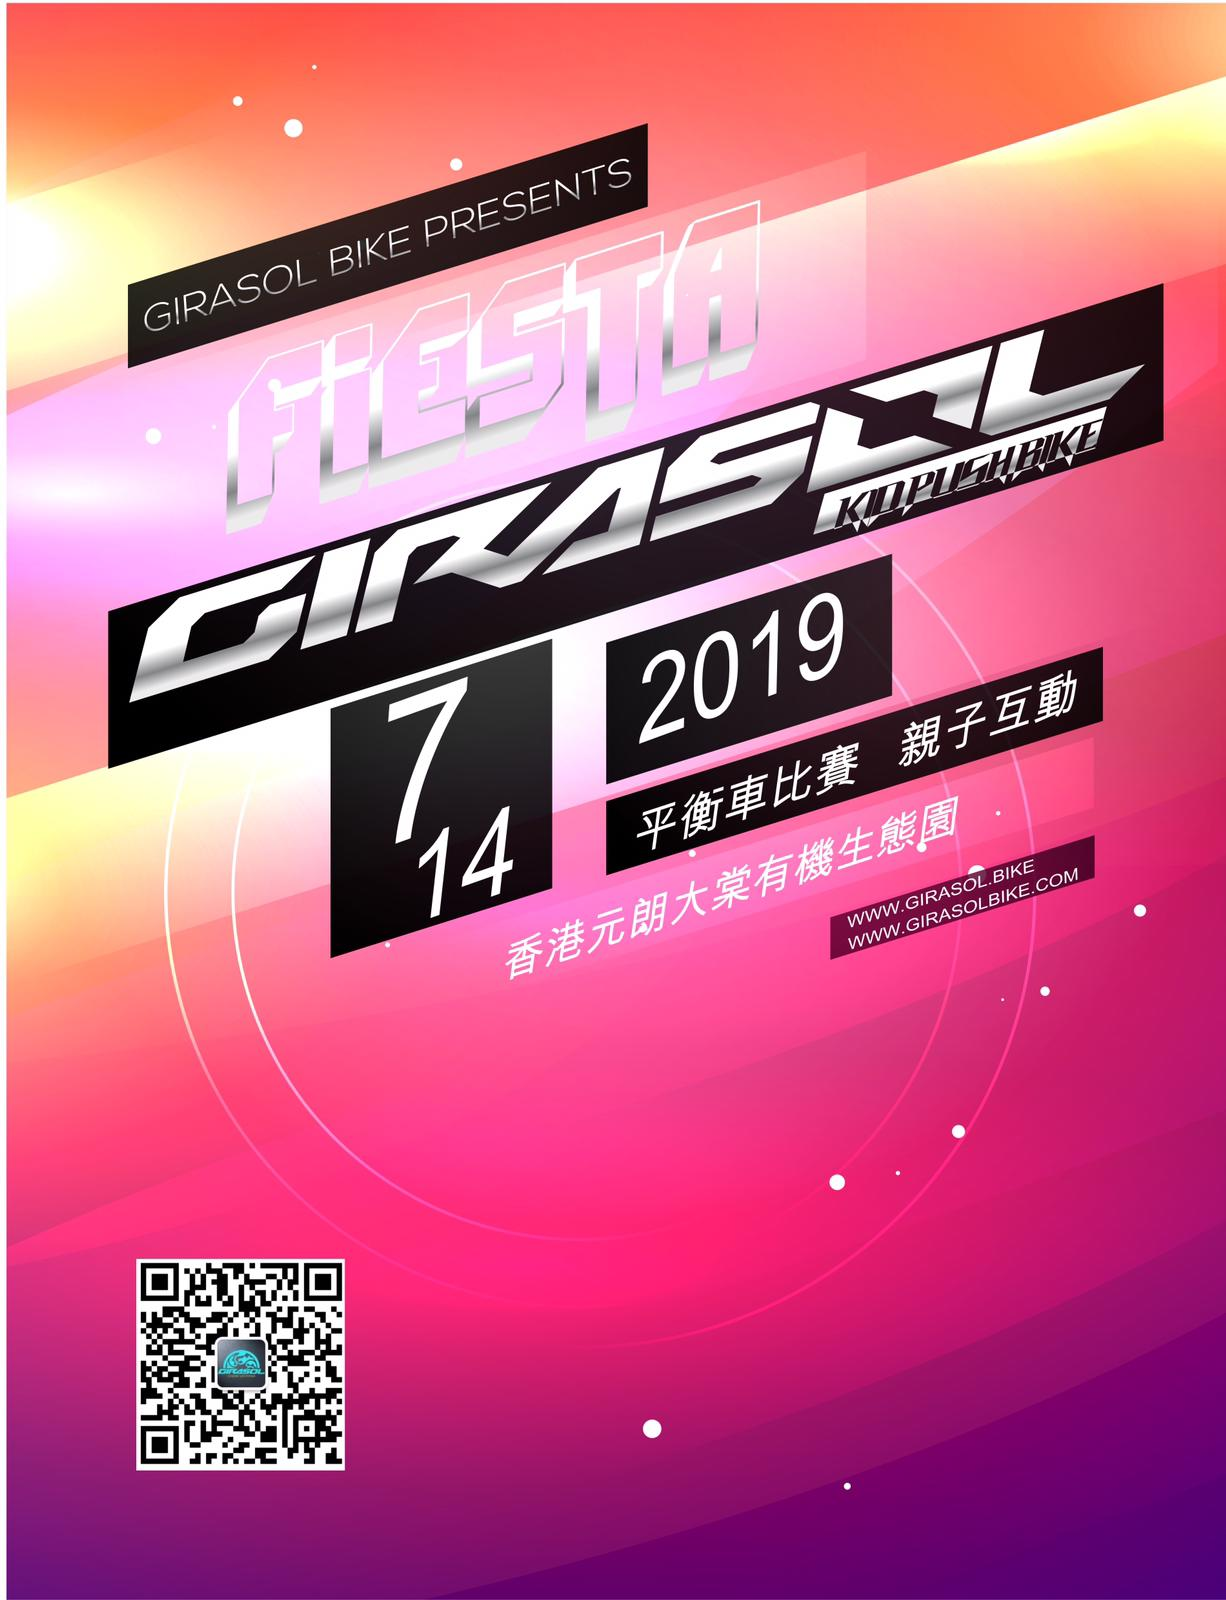 GIRASOL FIESTA HONG KONG 2019 - Family Relay 親子接力組別